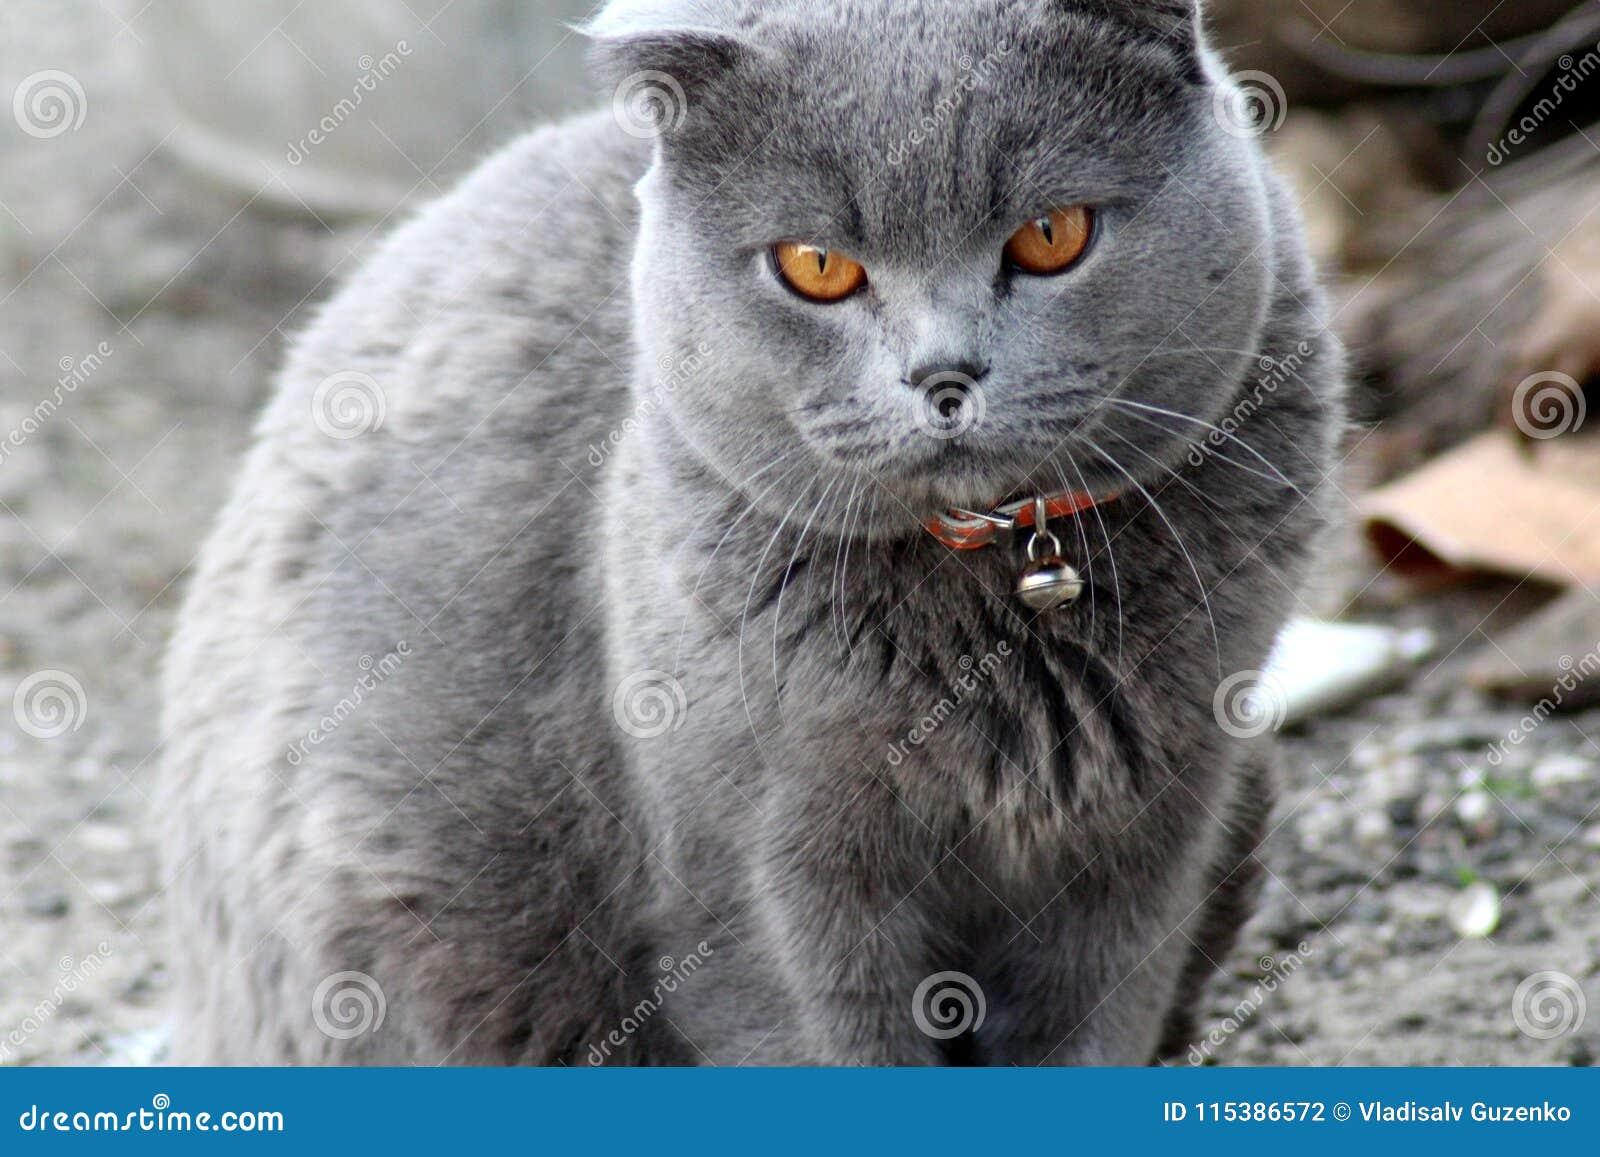 British cat in a red collar